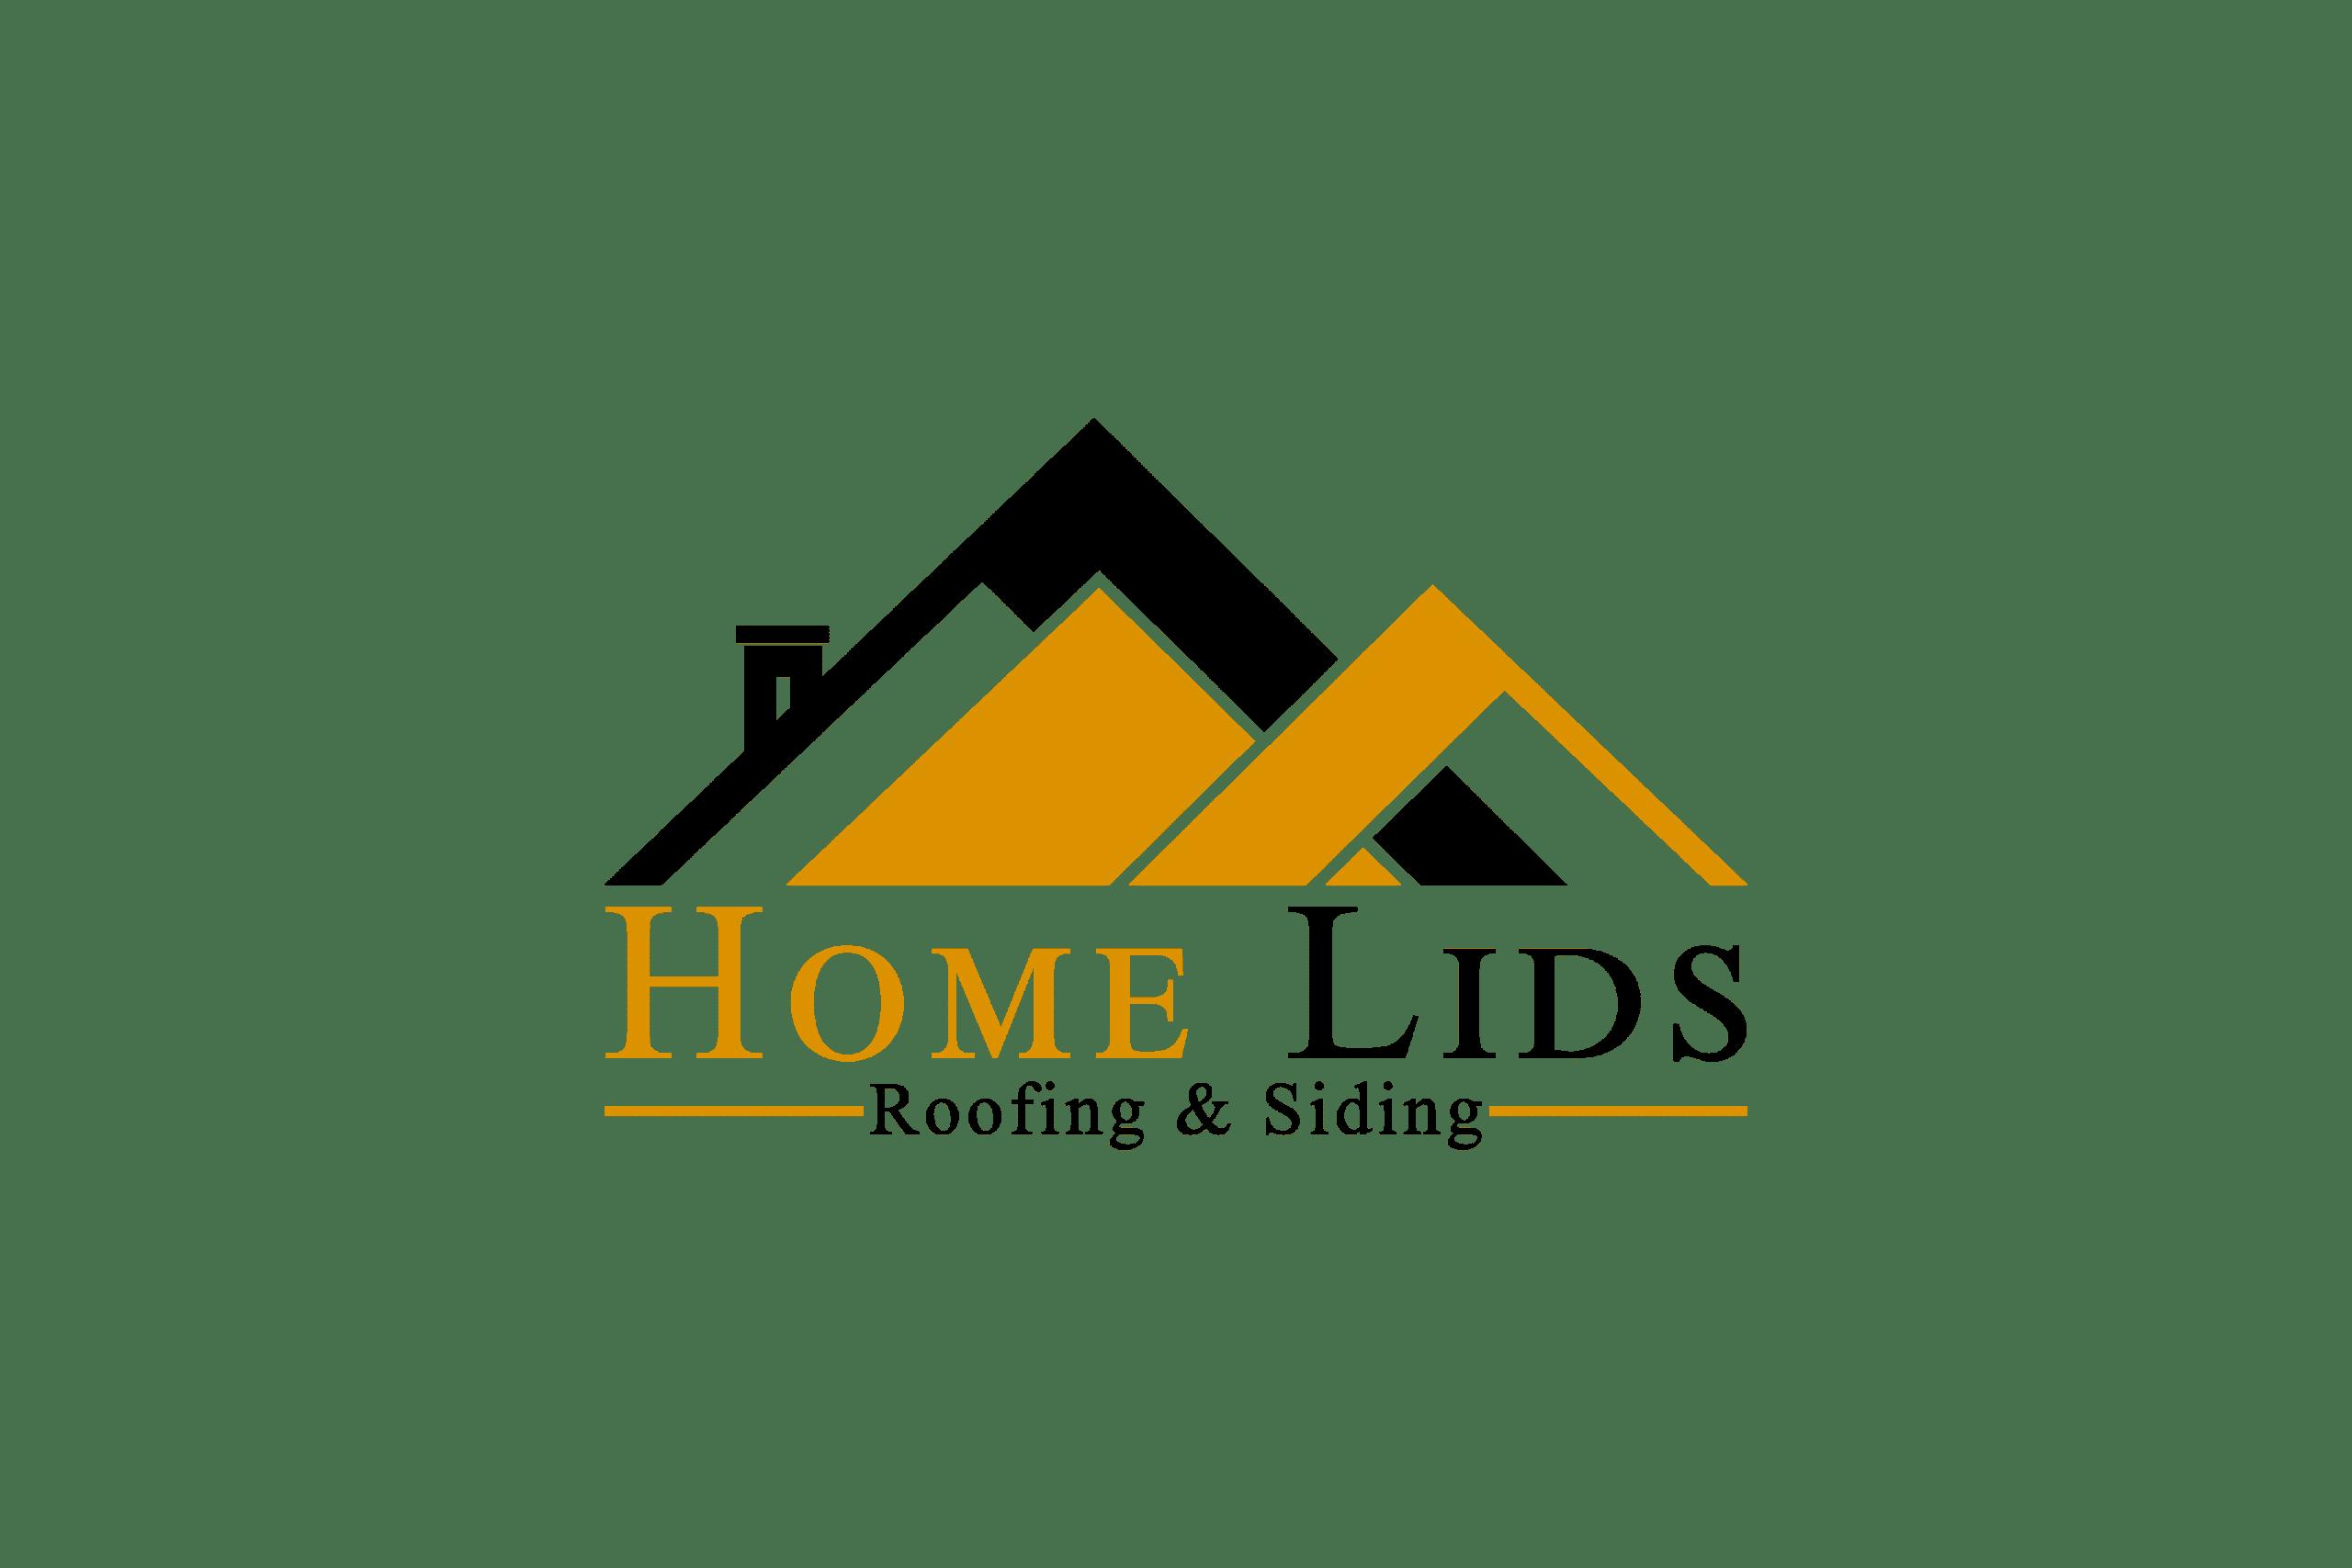 Home-lids-1 (1)